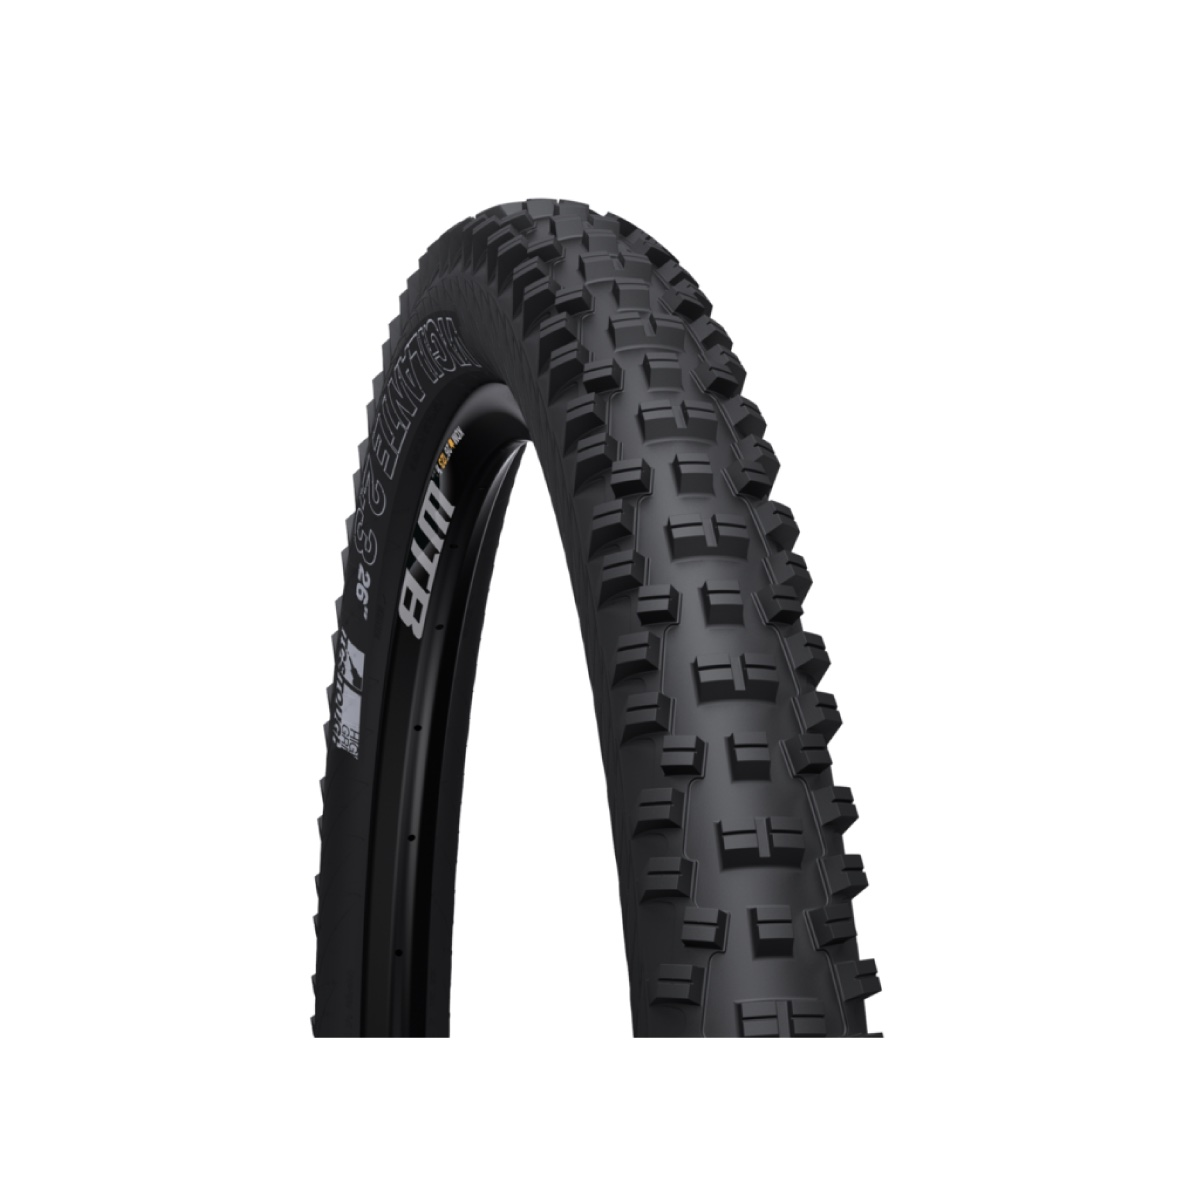 "WTB Vigilante Light/Fast Rolling Tire 2.3 x 27.5"""